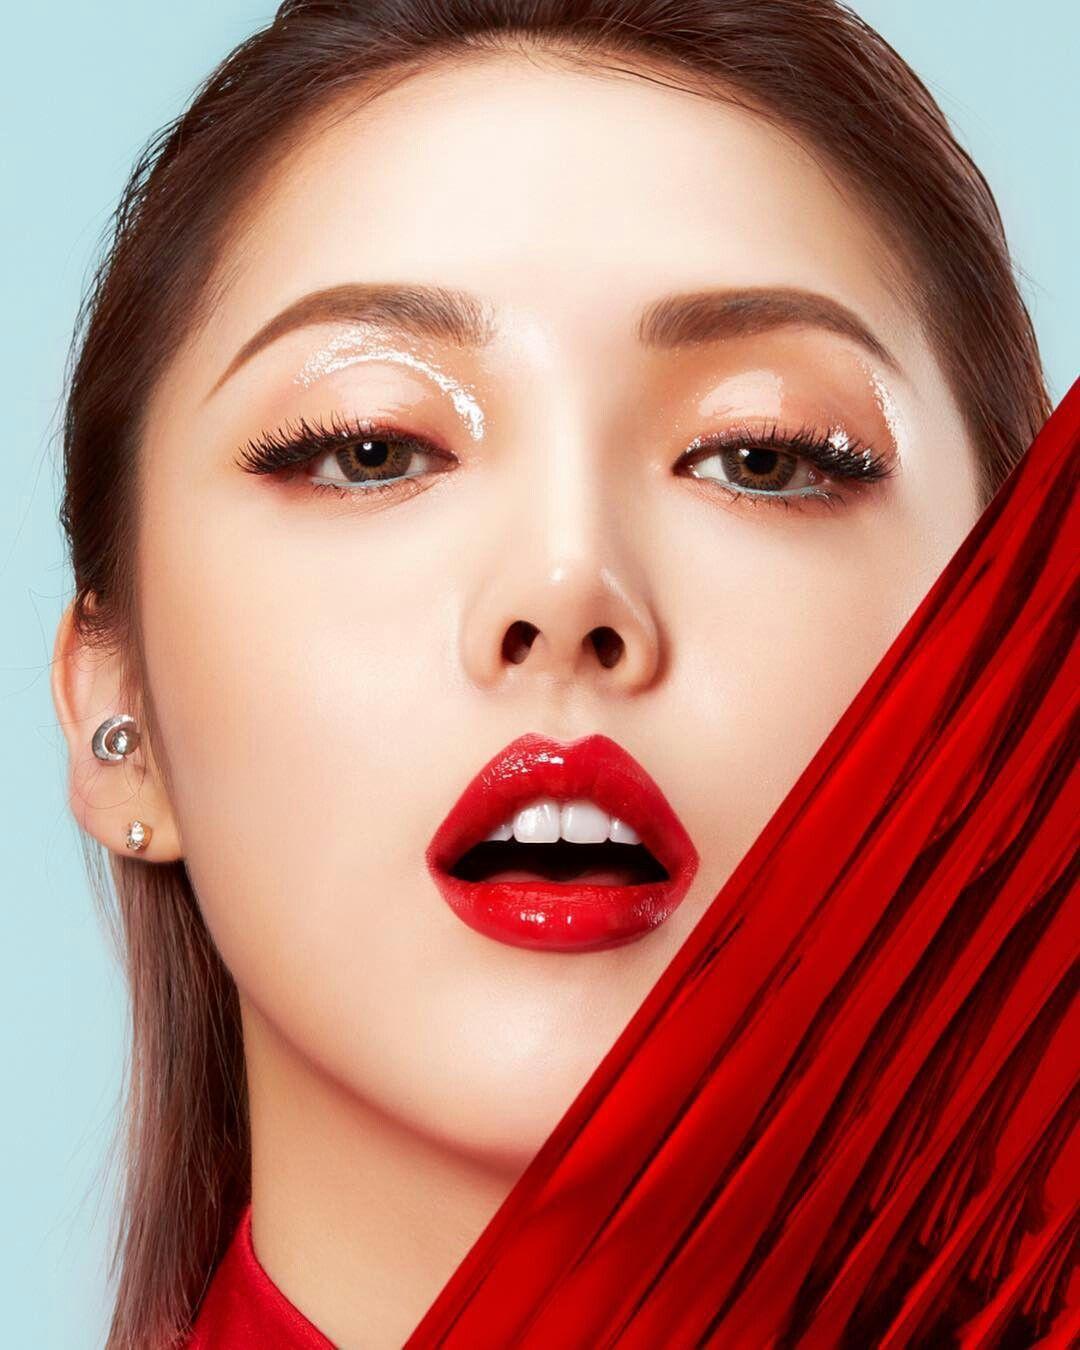 Pony Park Hye Min 박혜민 포니 Korean makeup artist